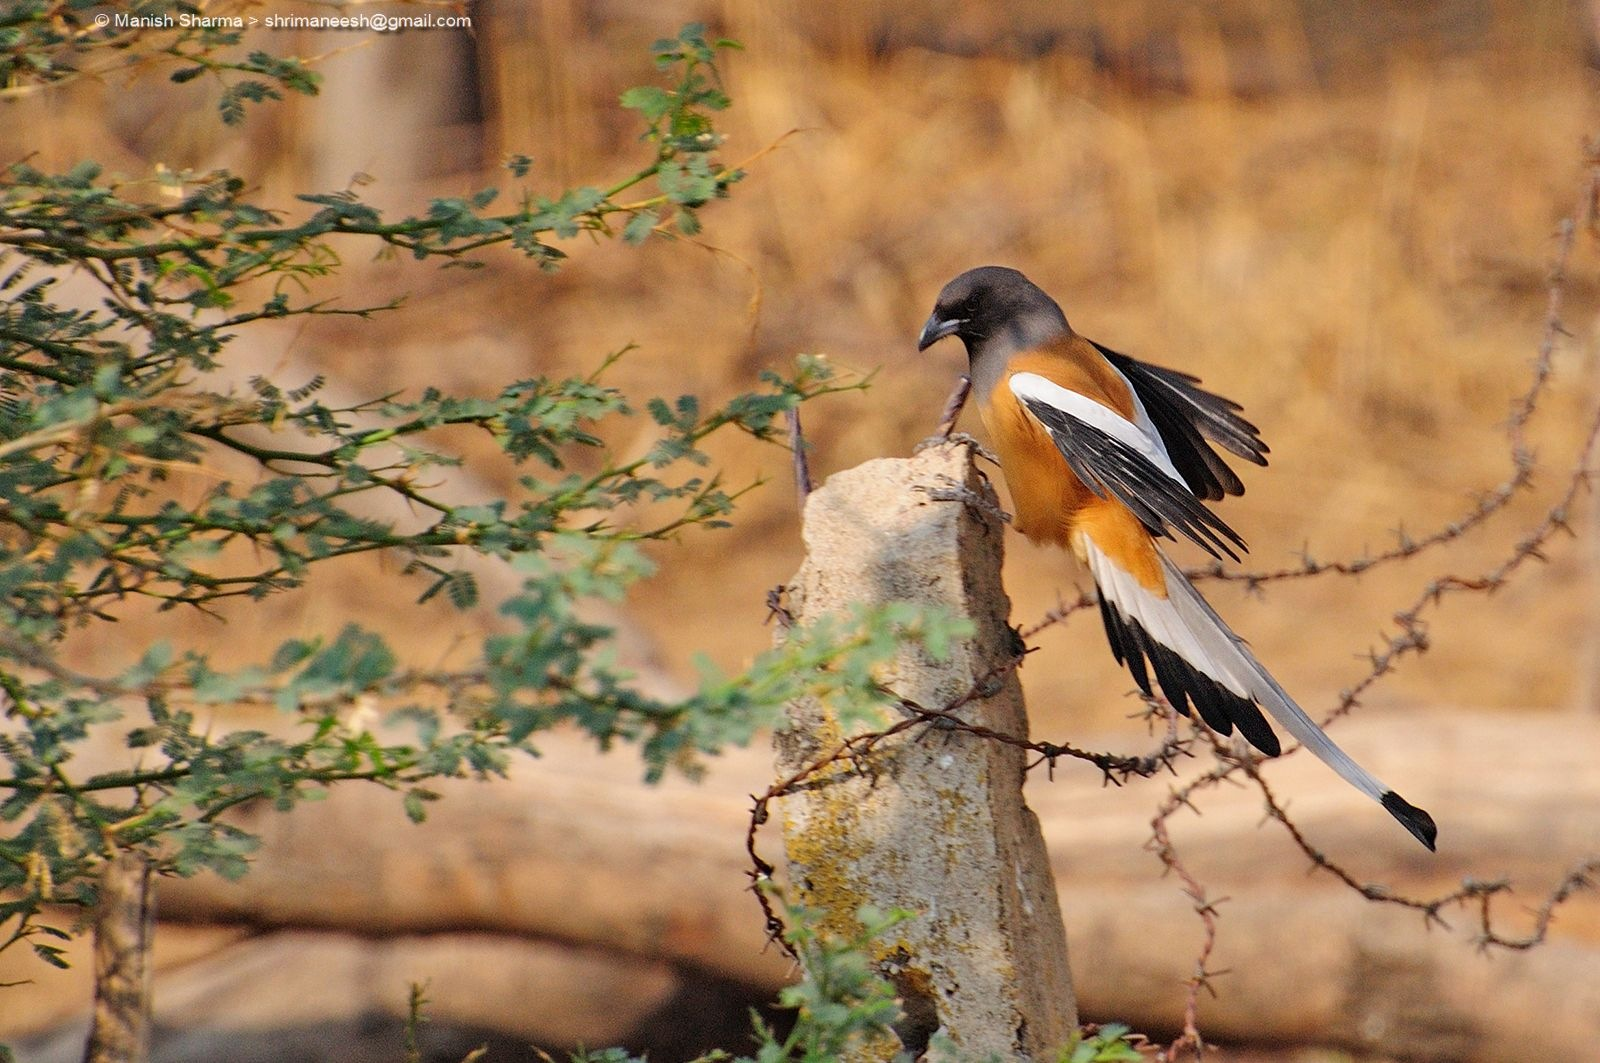 Rufous Treepie....Scientific name: Dendrocitta vagabunda by Maneesh Sharma